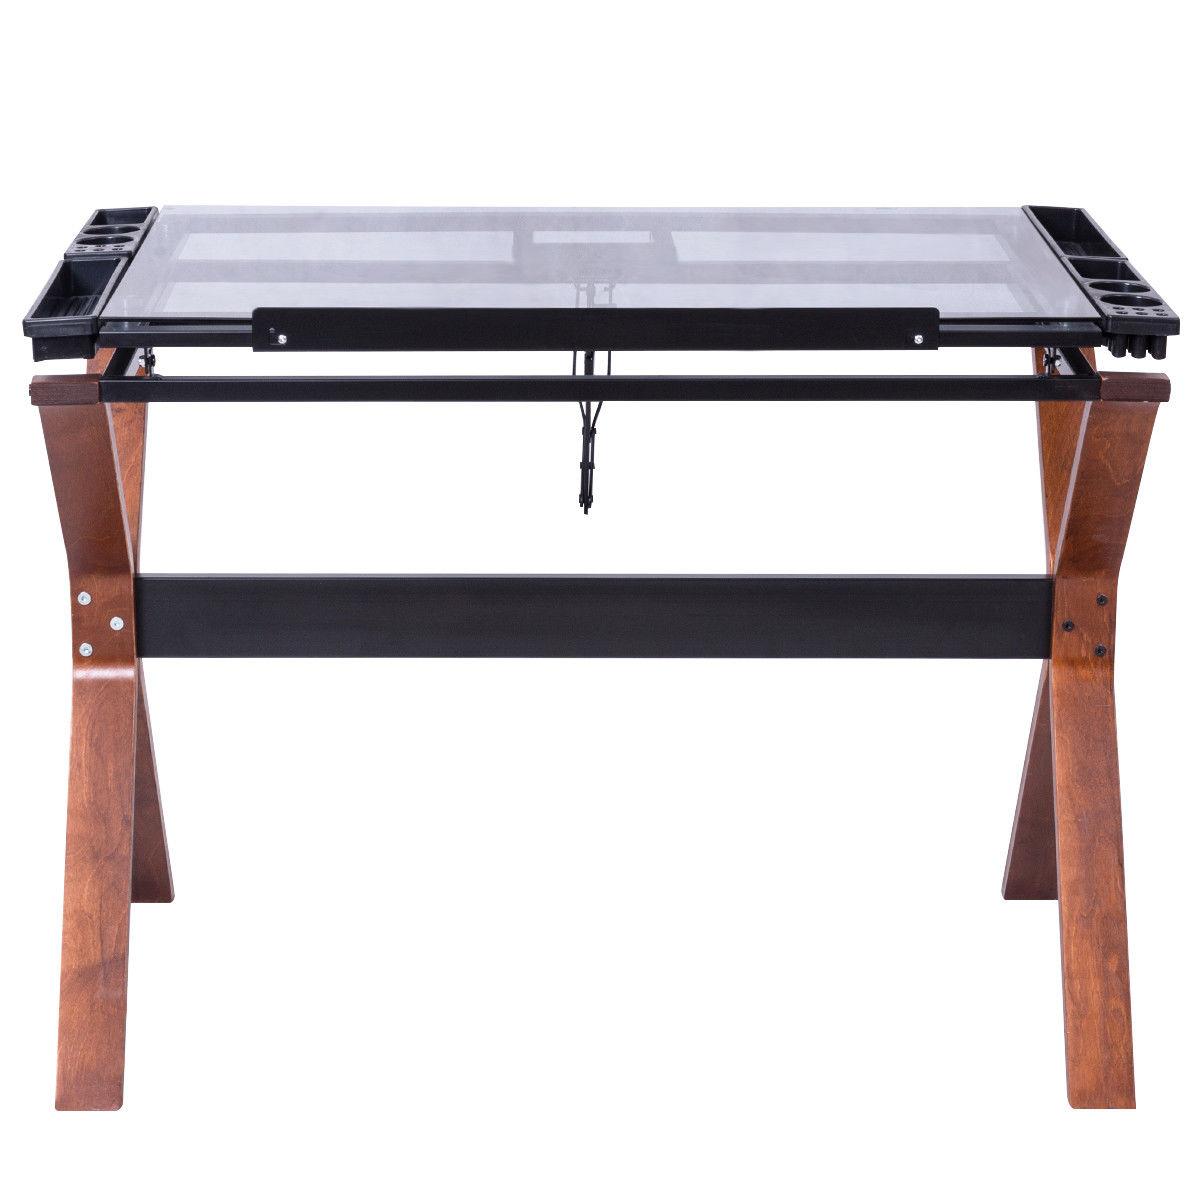 Giantex Adjustable Drafting Table Craft Station Modern Drawing Desk Glass  Top Art U0026 Craft Hobby Furniture HW56042 In Laptop Desks From Furniture On  ...